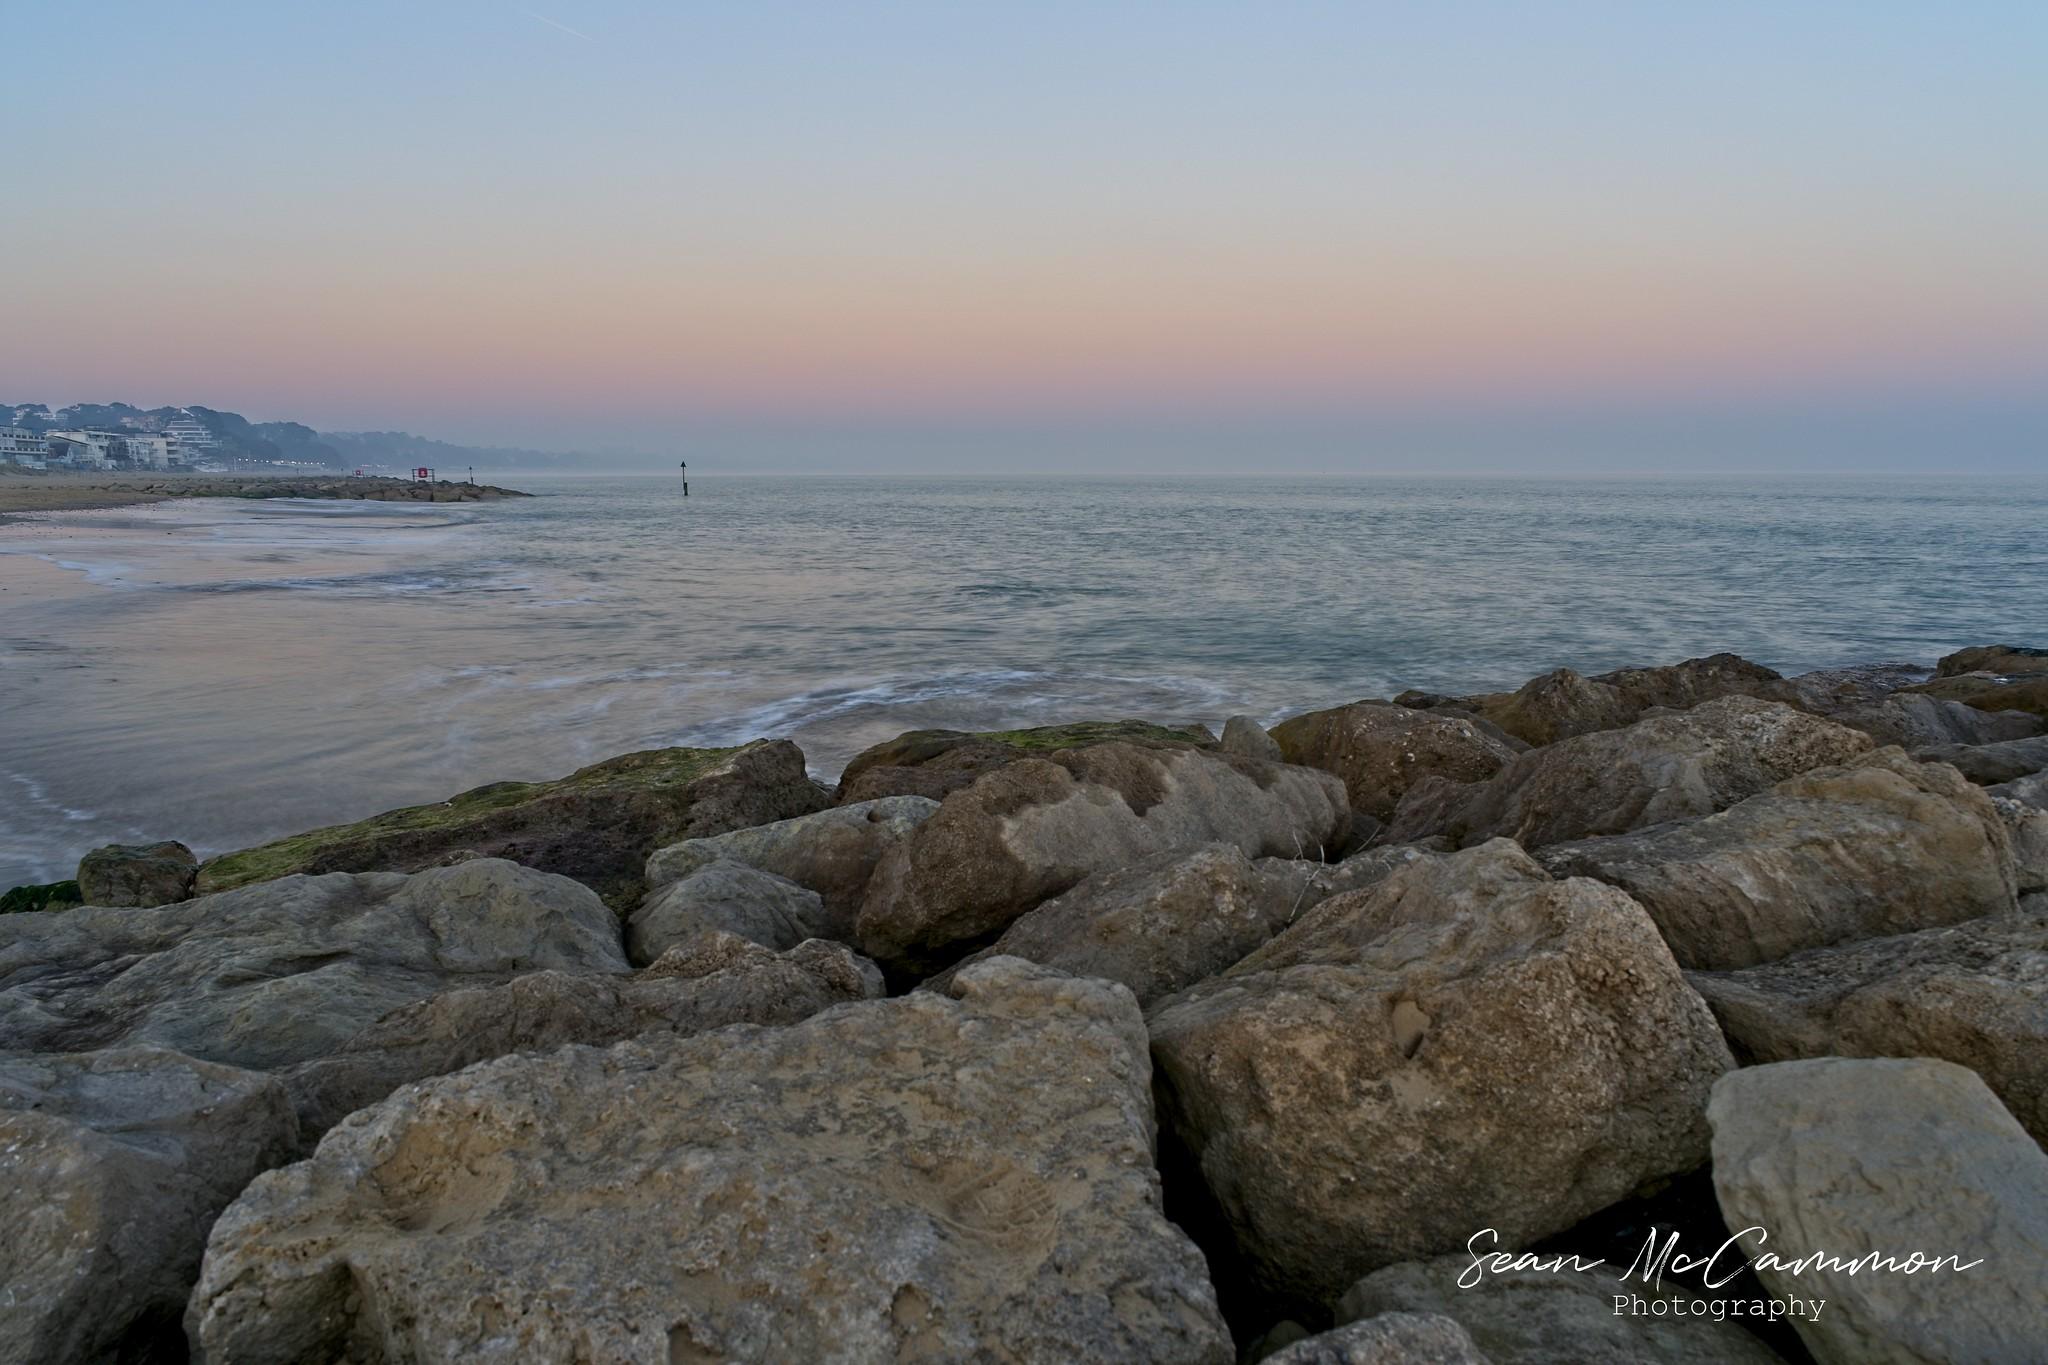 Sandbanks Sea and Rocks HDR - Looking towards Bournemouth at Sandbanks on 27th February 2019